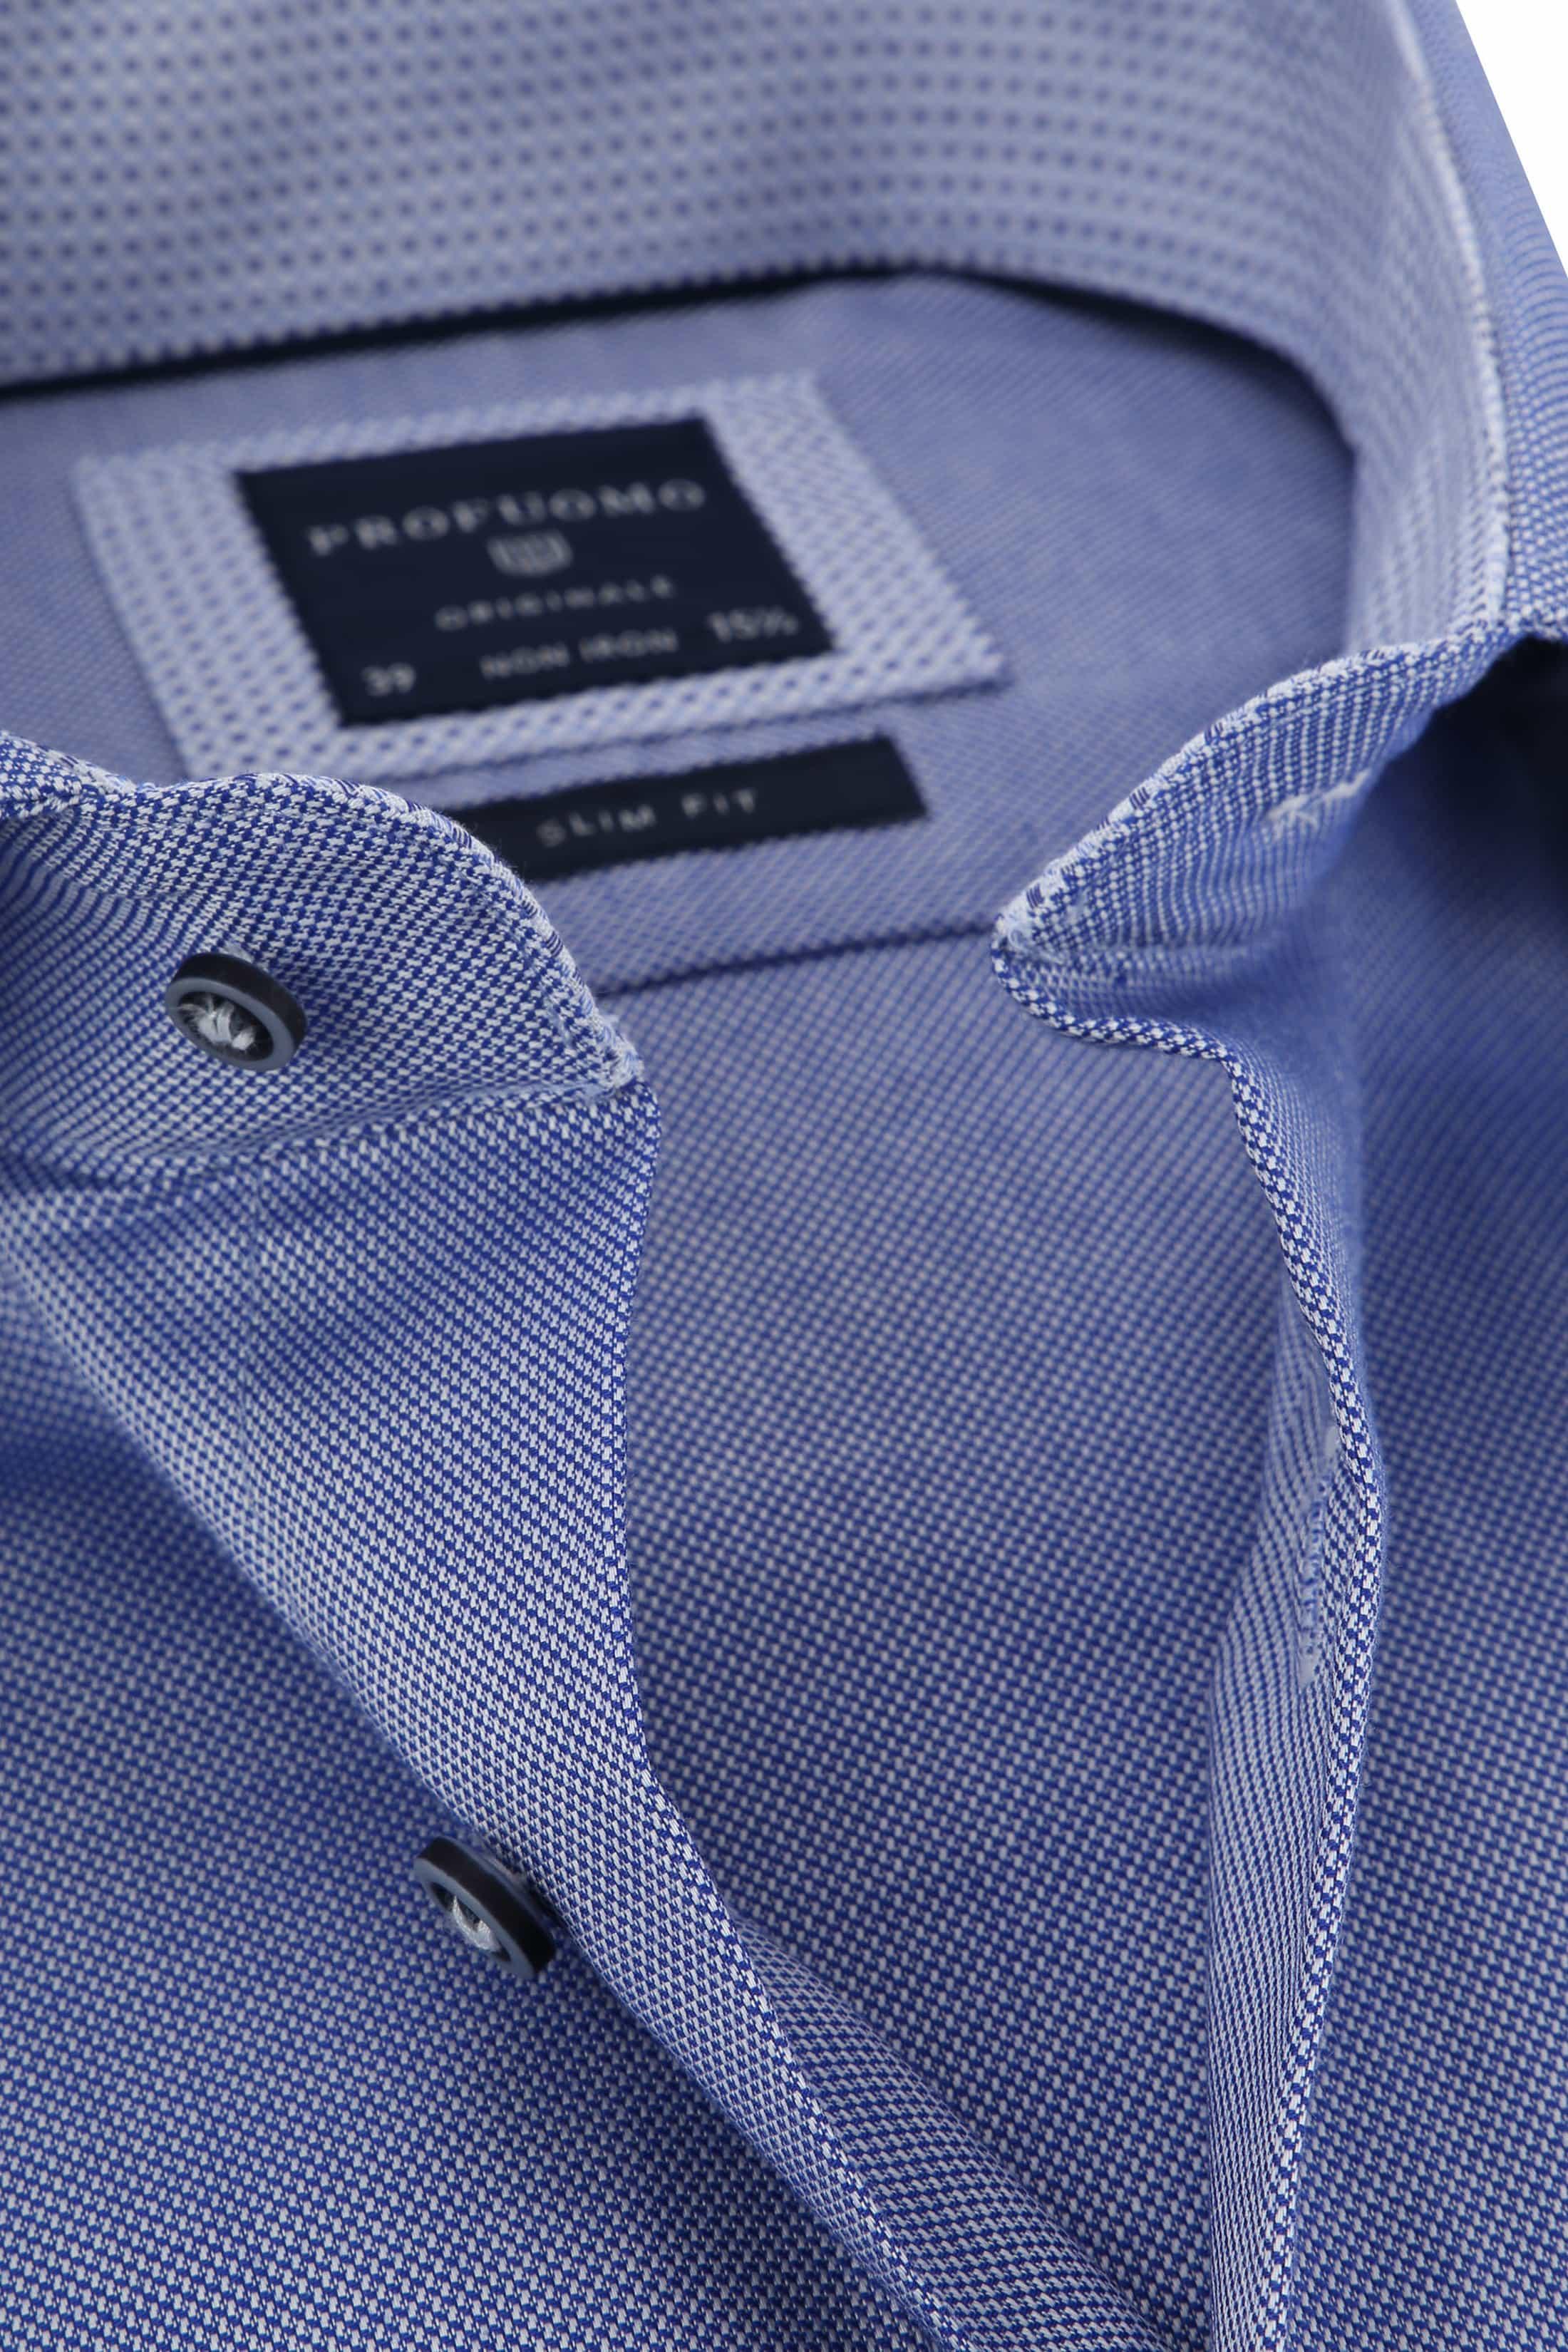 Profuomo Overhemd Navy CAW foto 1